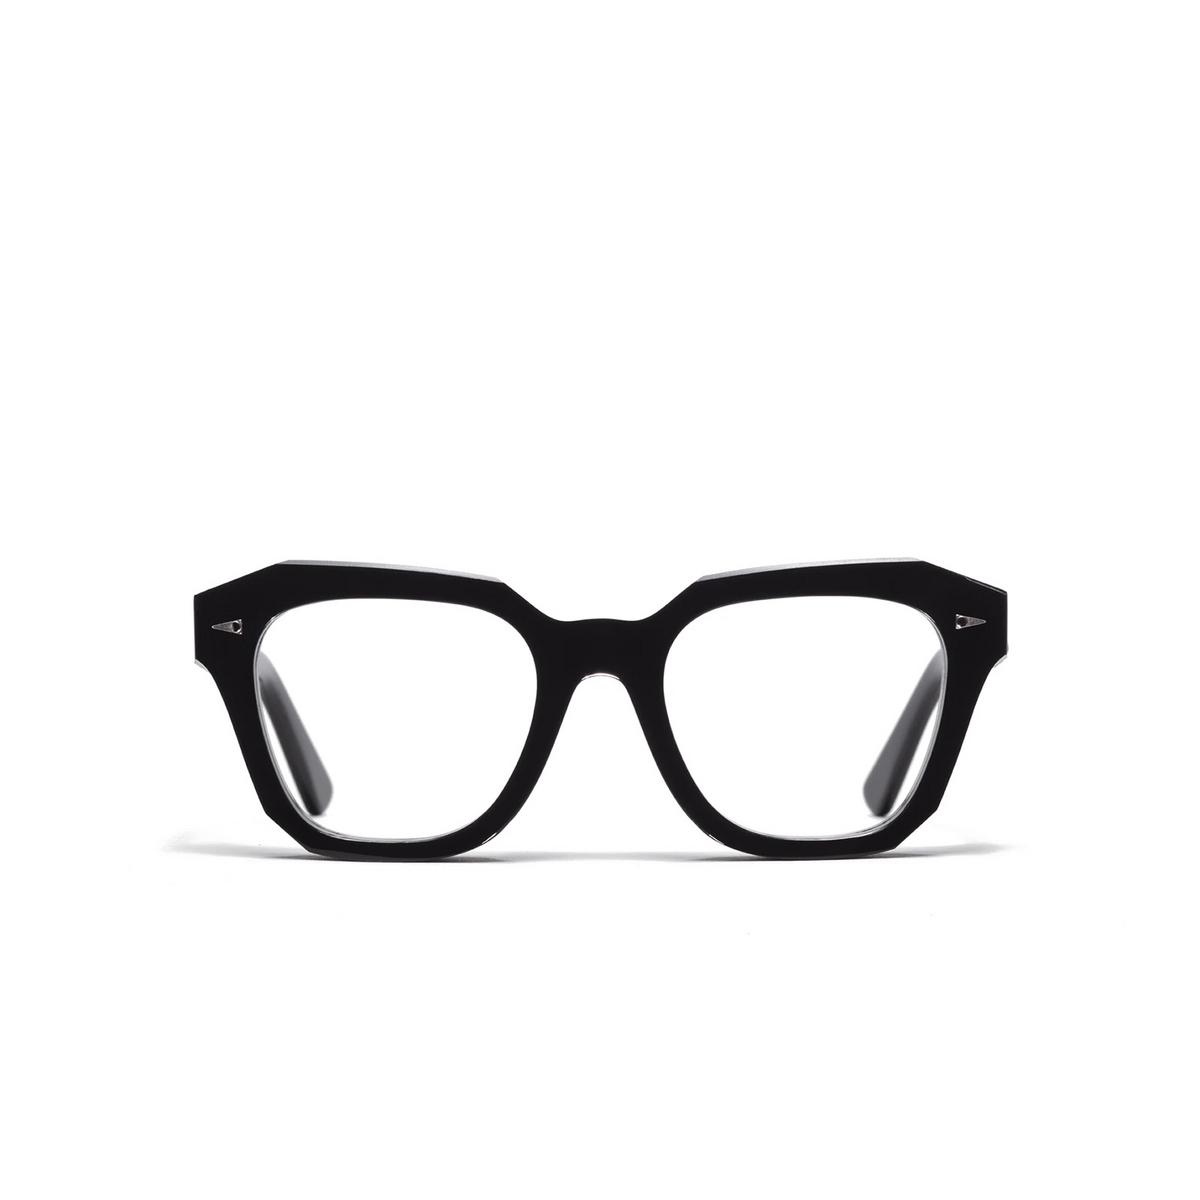 Ahlem® Square Eyeglasses: PONT DES ARTS OPTIC RAW 8MM color Black.